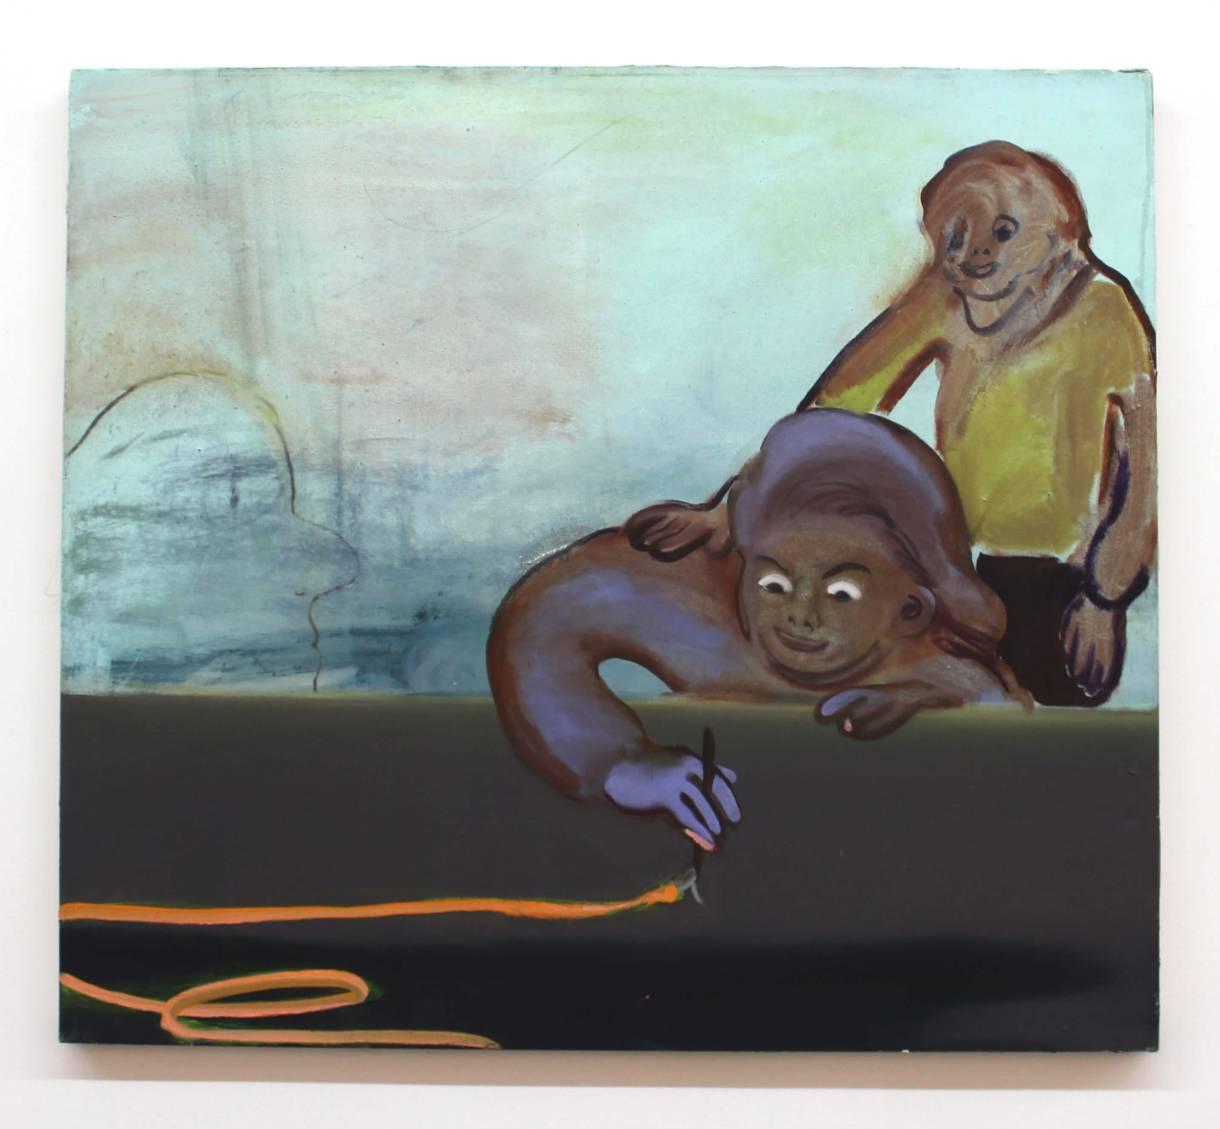 heidi-hahn-paintings-body-image-1460761969